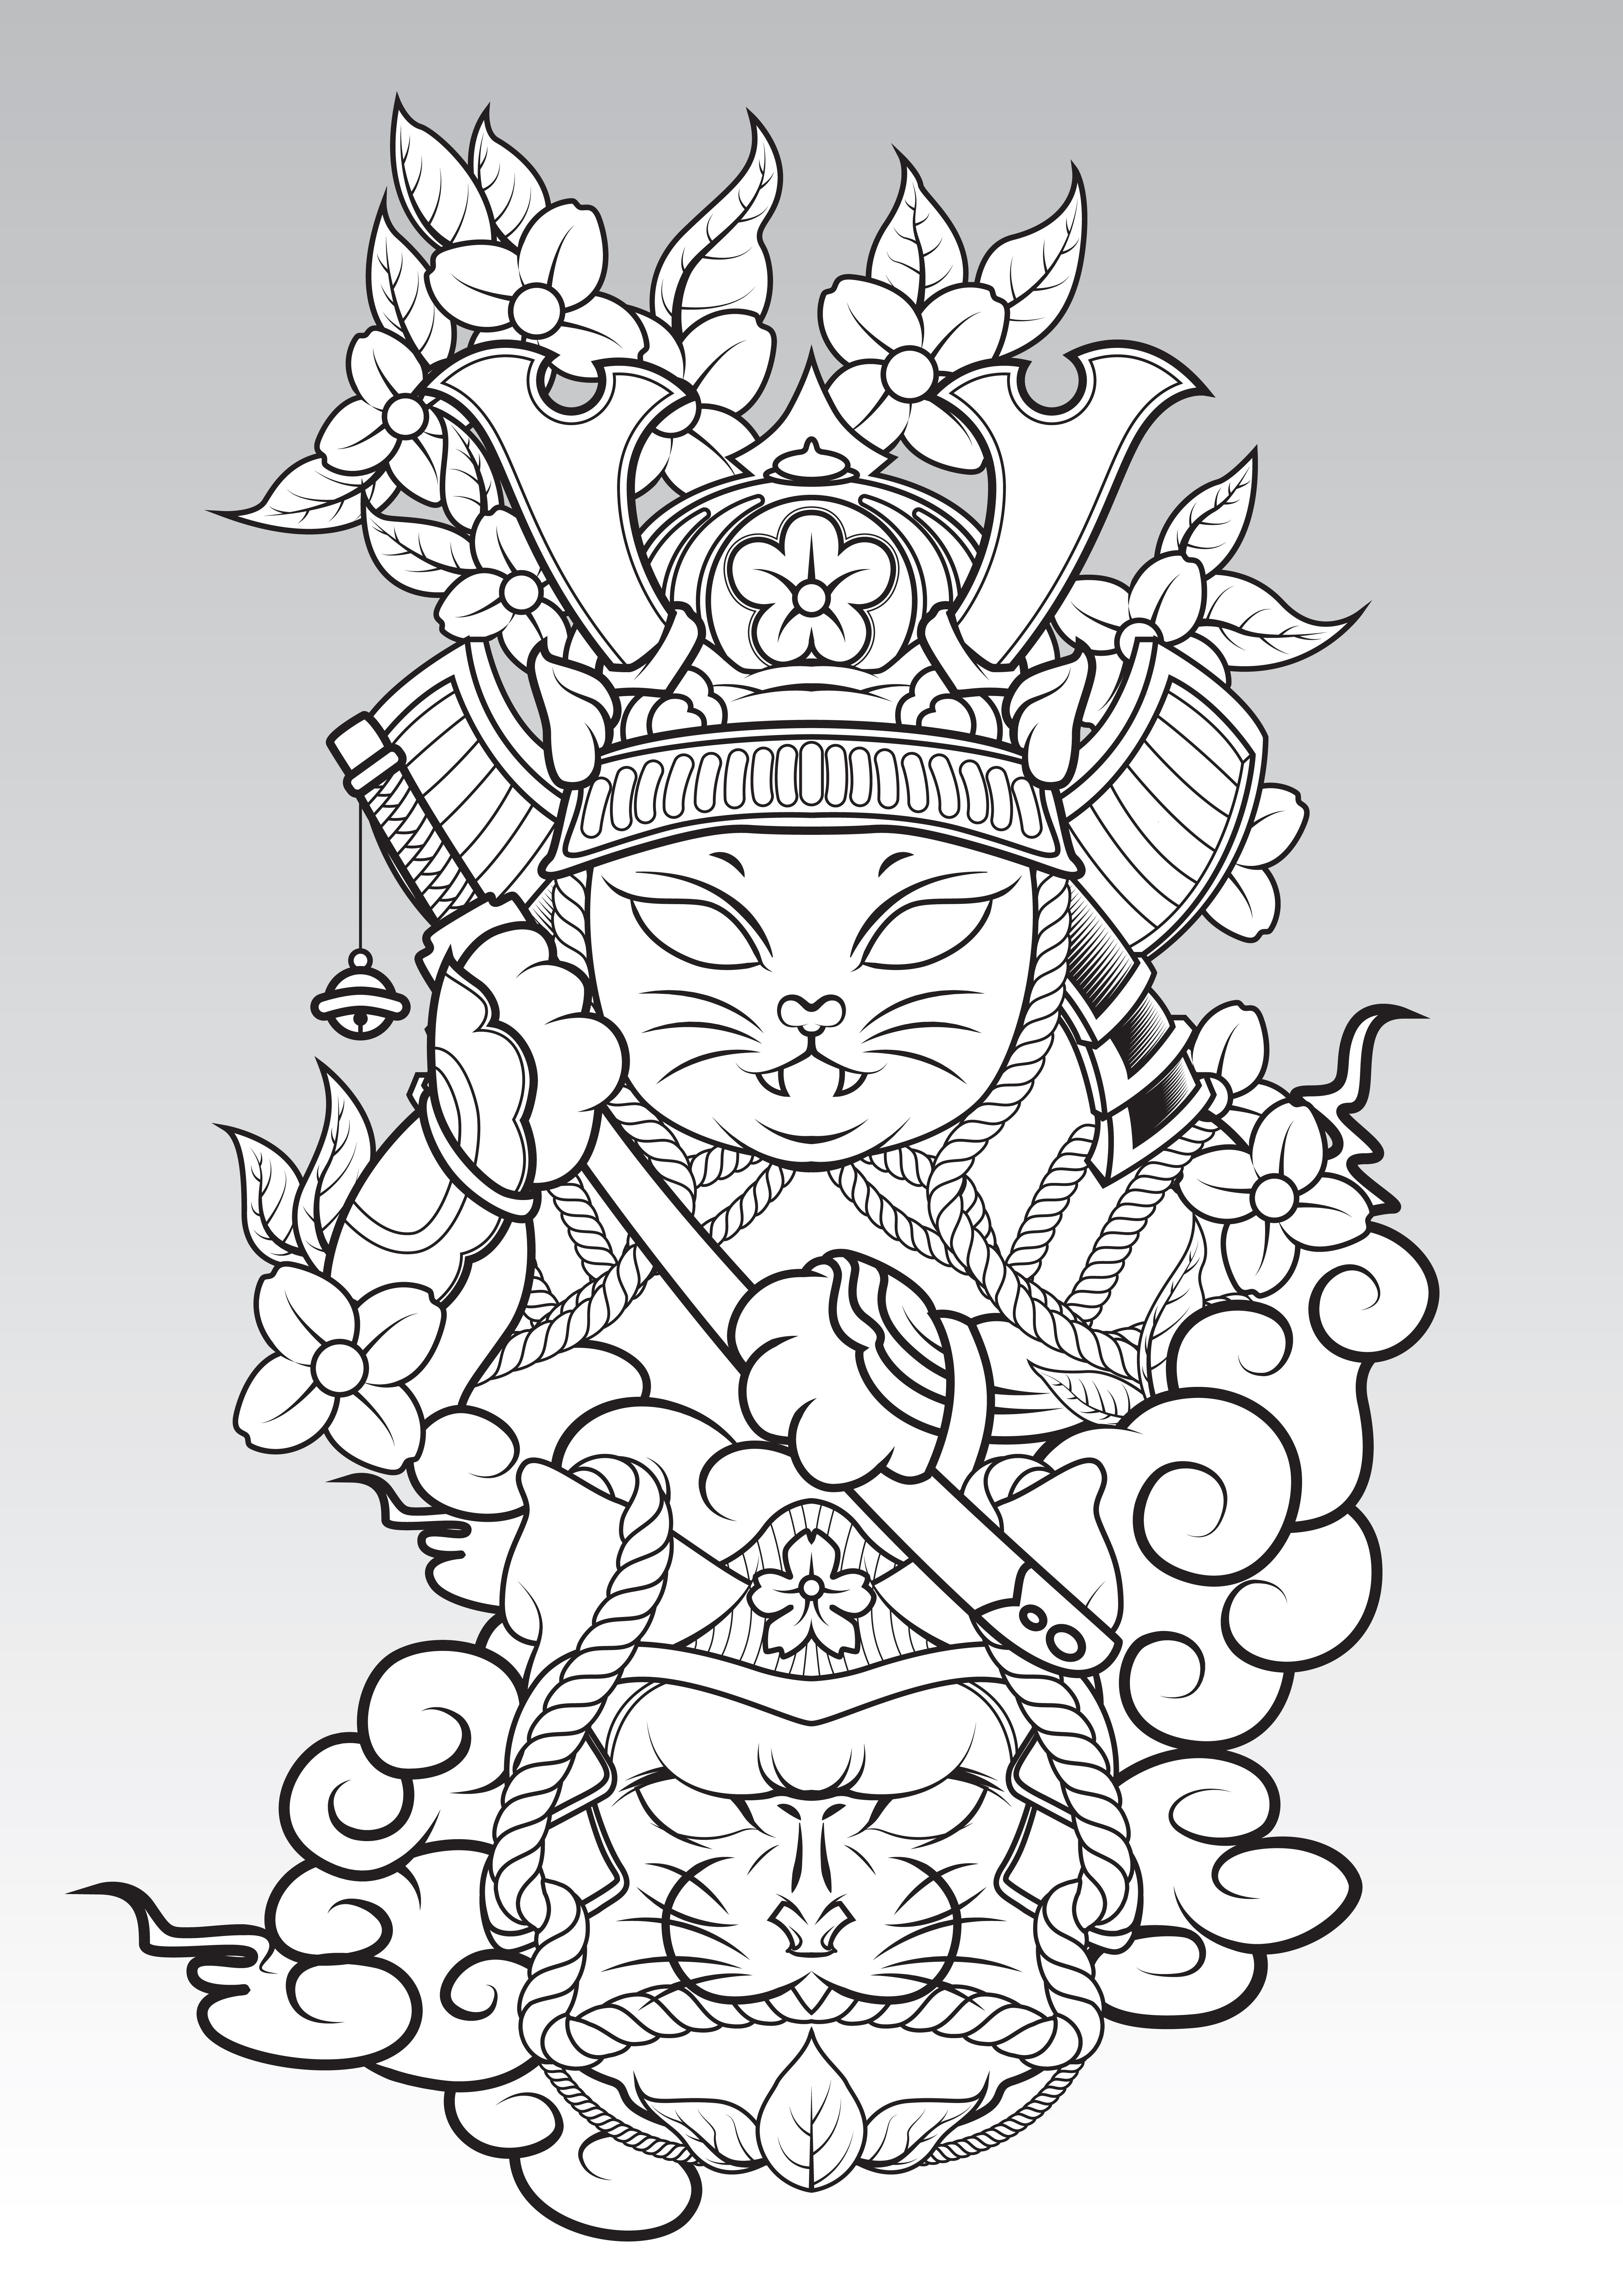 Cat Samurai On Colud And Sakura Blossom., Japanese Tattoo